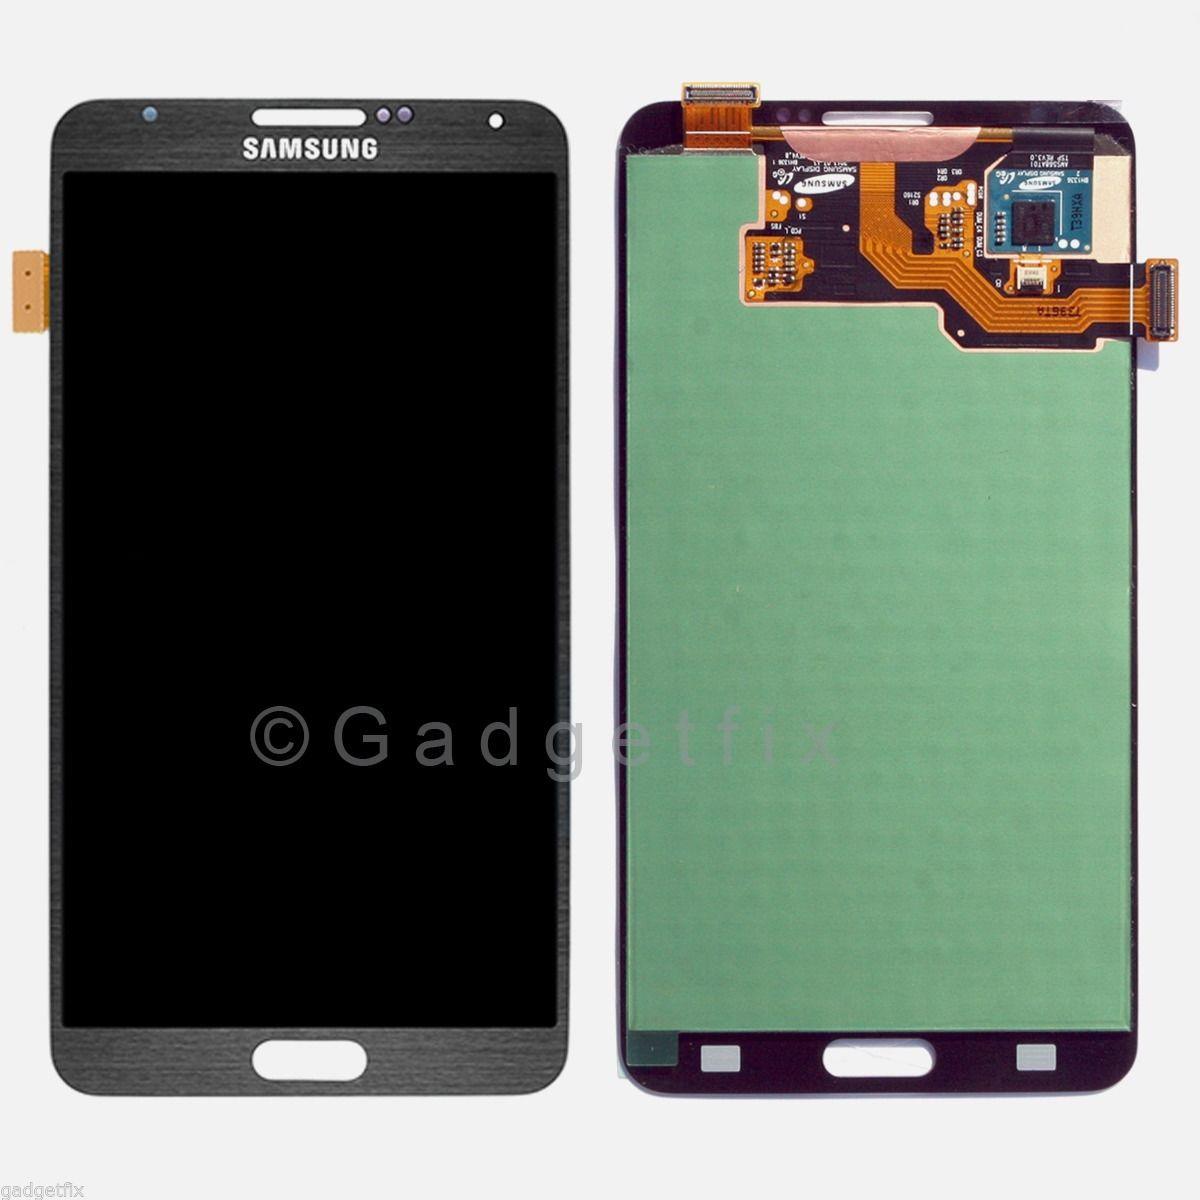 OEM Samsung Galaxy Note 3 N9005 N900V N900P LCD Display Touch Screen Digitizer